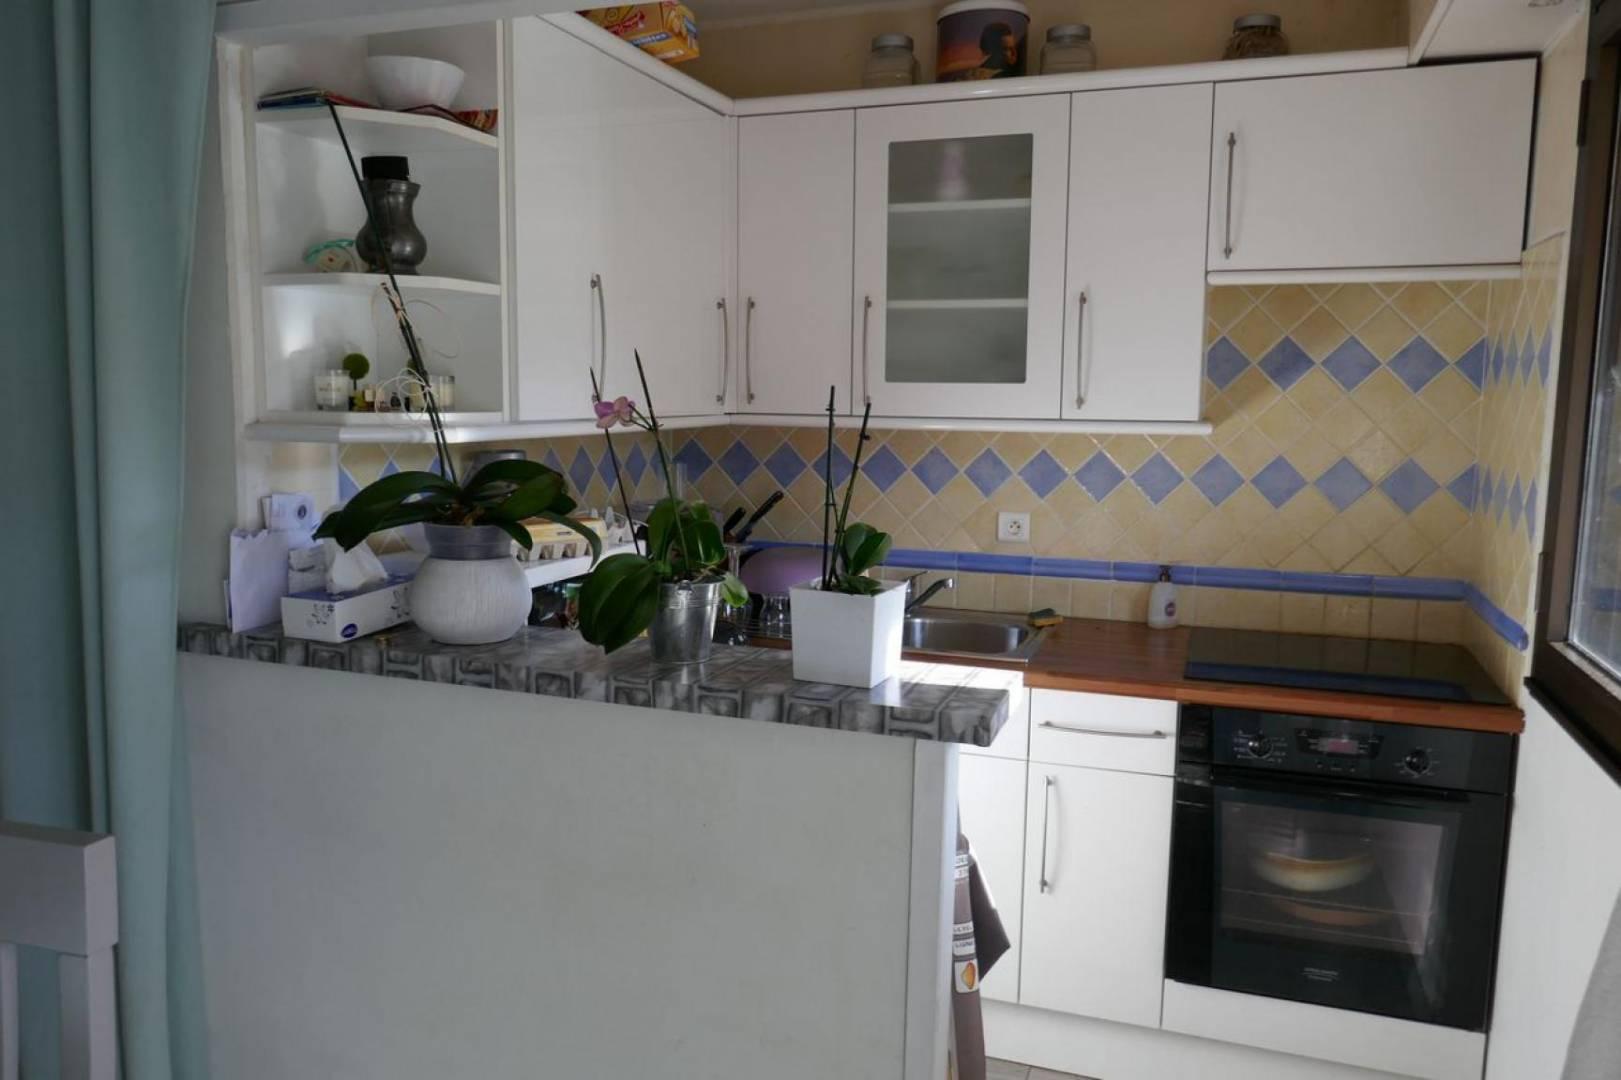 appartement cagnes sur mer 06800 viager occup cagnes sur mer. Black Bedroom Furniture Sets. Home Design Ideas